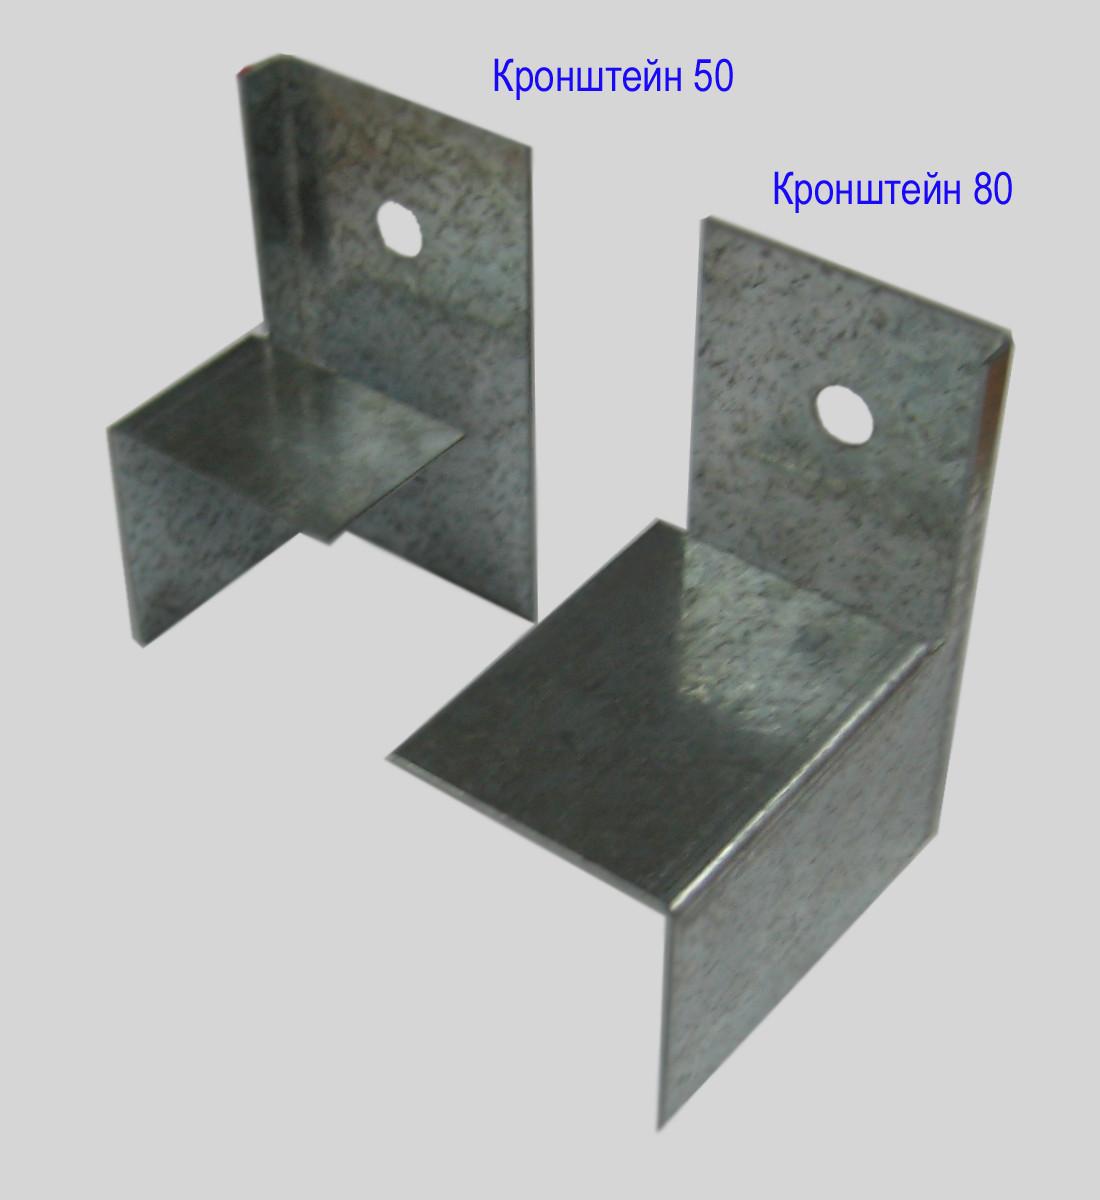 Кронштейн оцинкованный КР-150, тол. 2 мм